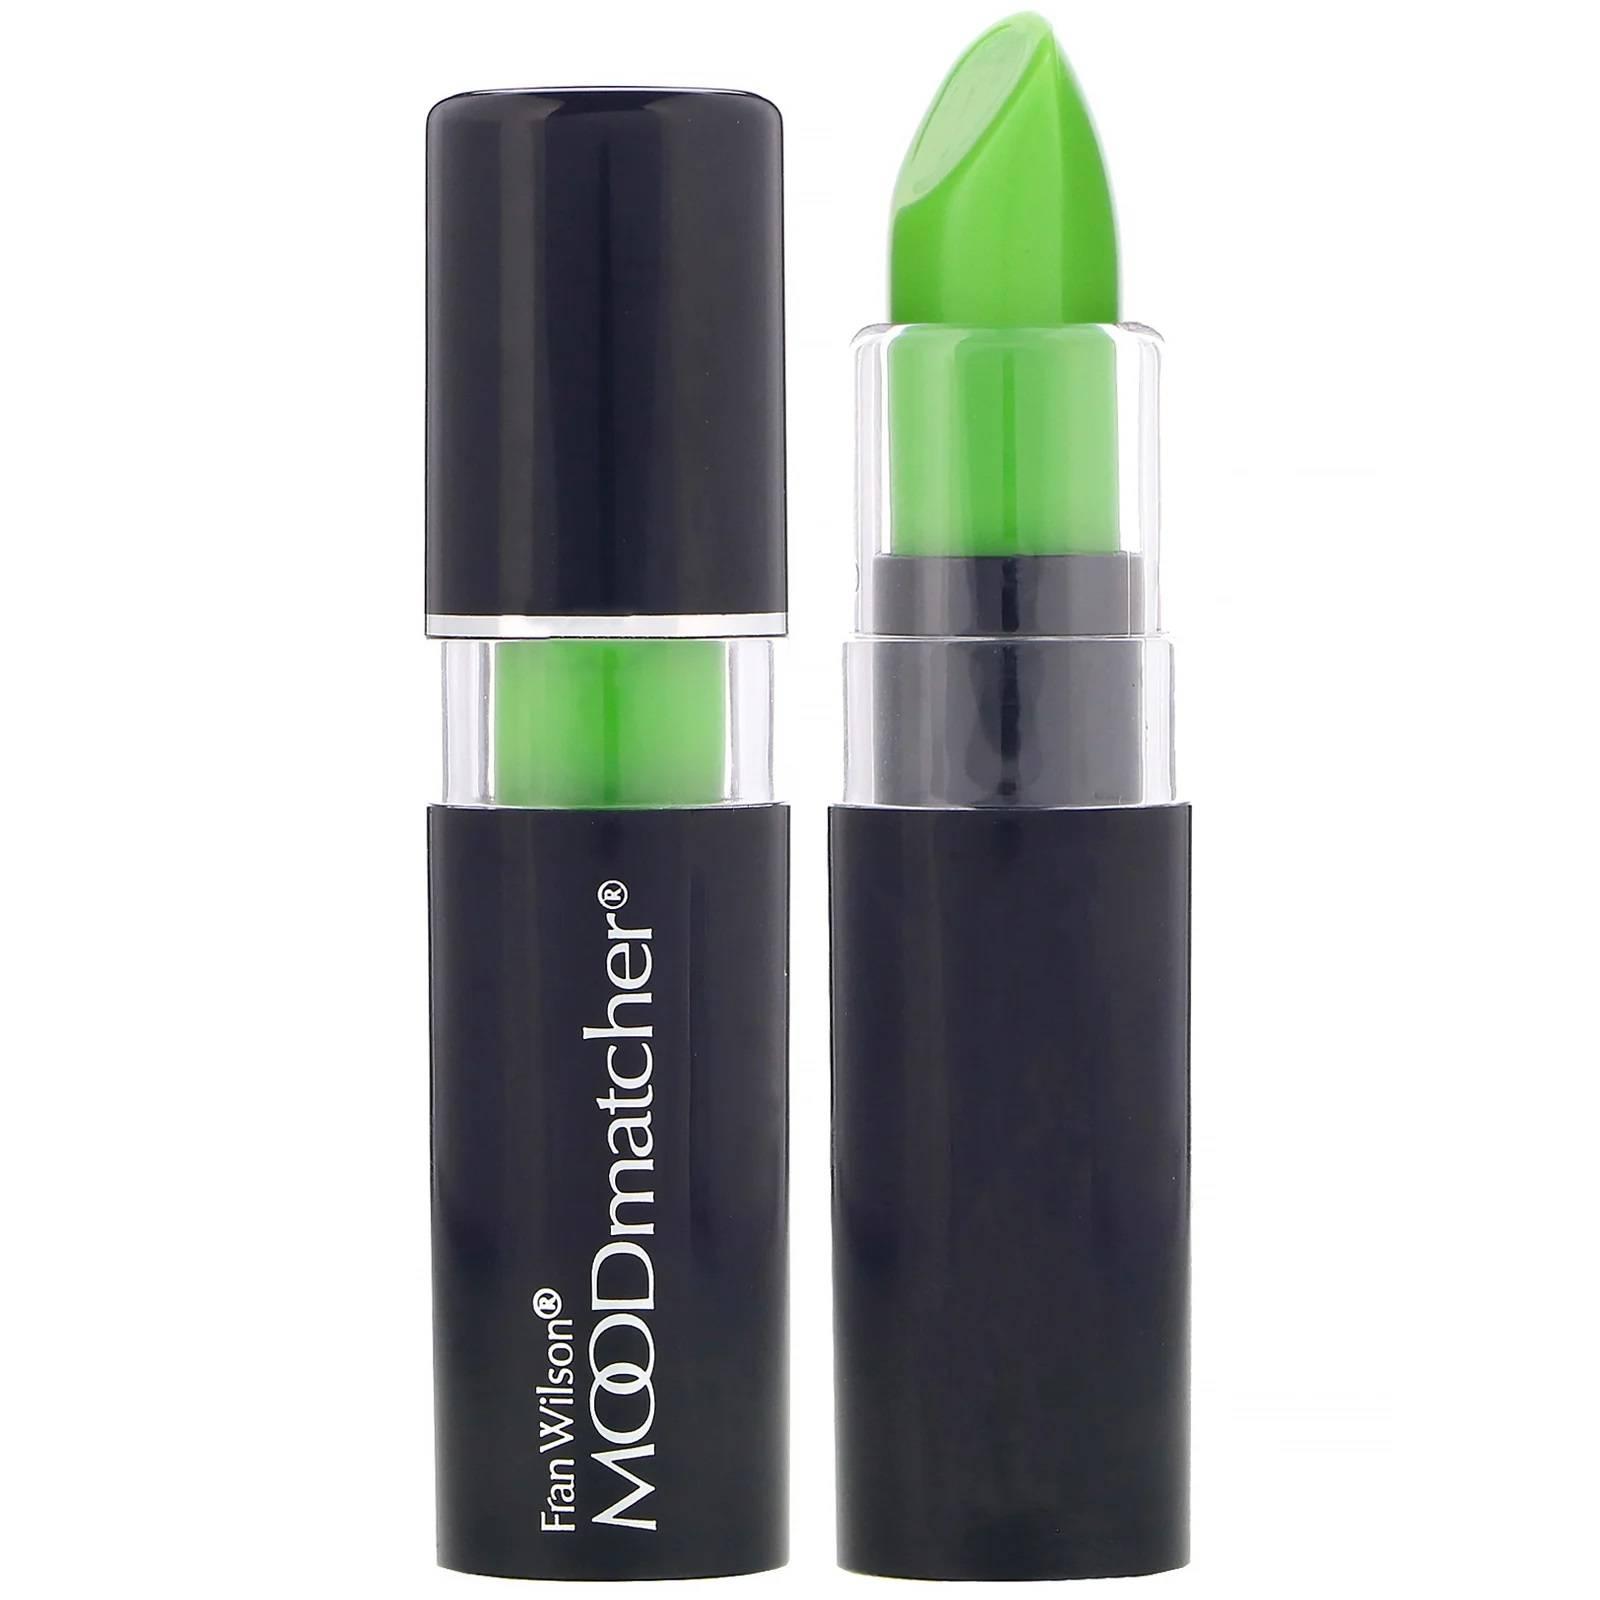 Moodmatcher 唇膏 3.5公克 綠 粉 黃 橙 藍 五種顏色 Mood matcher